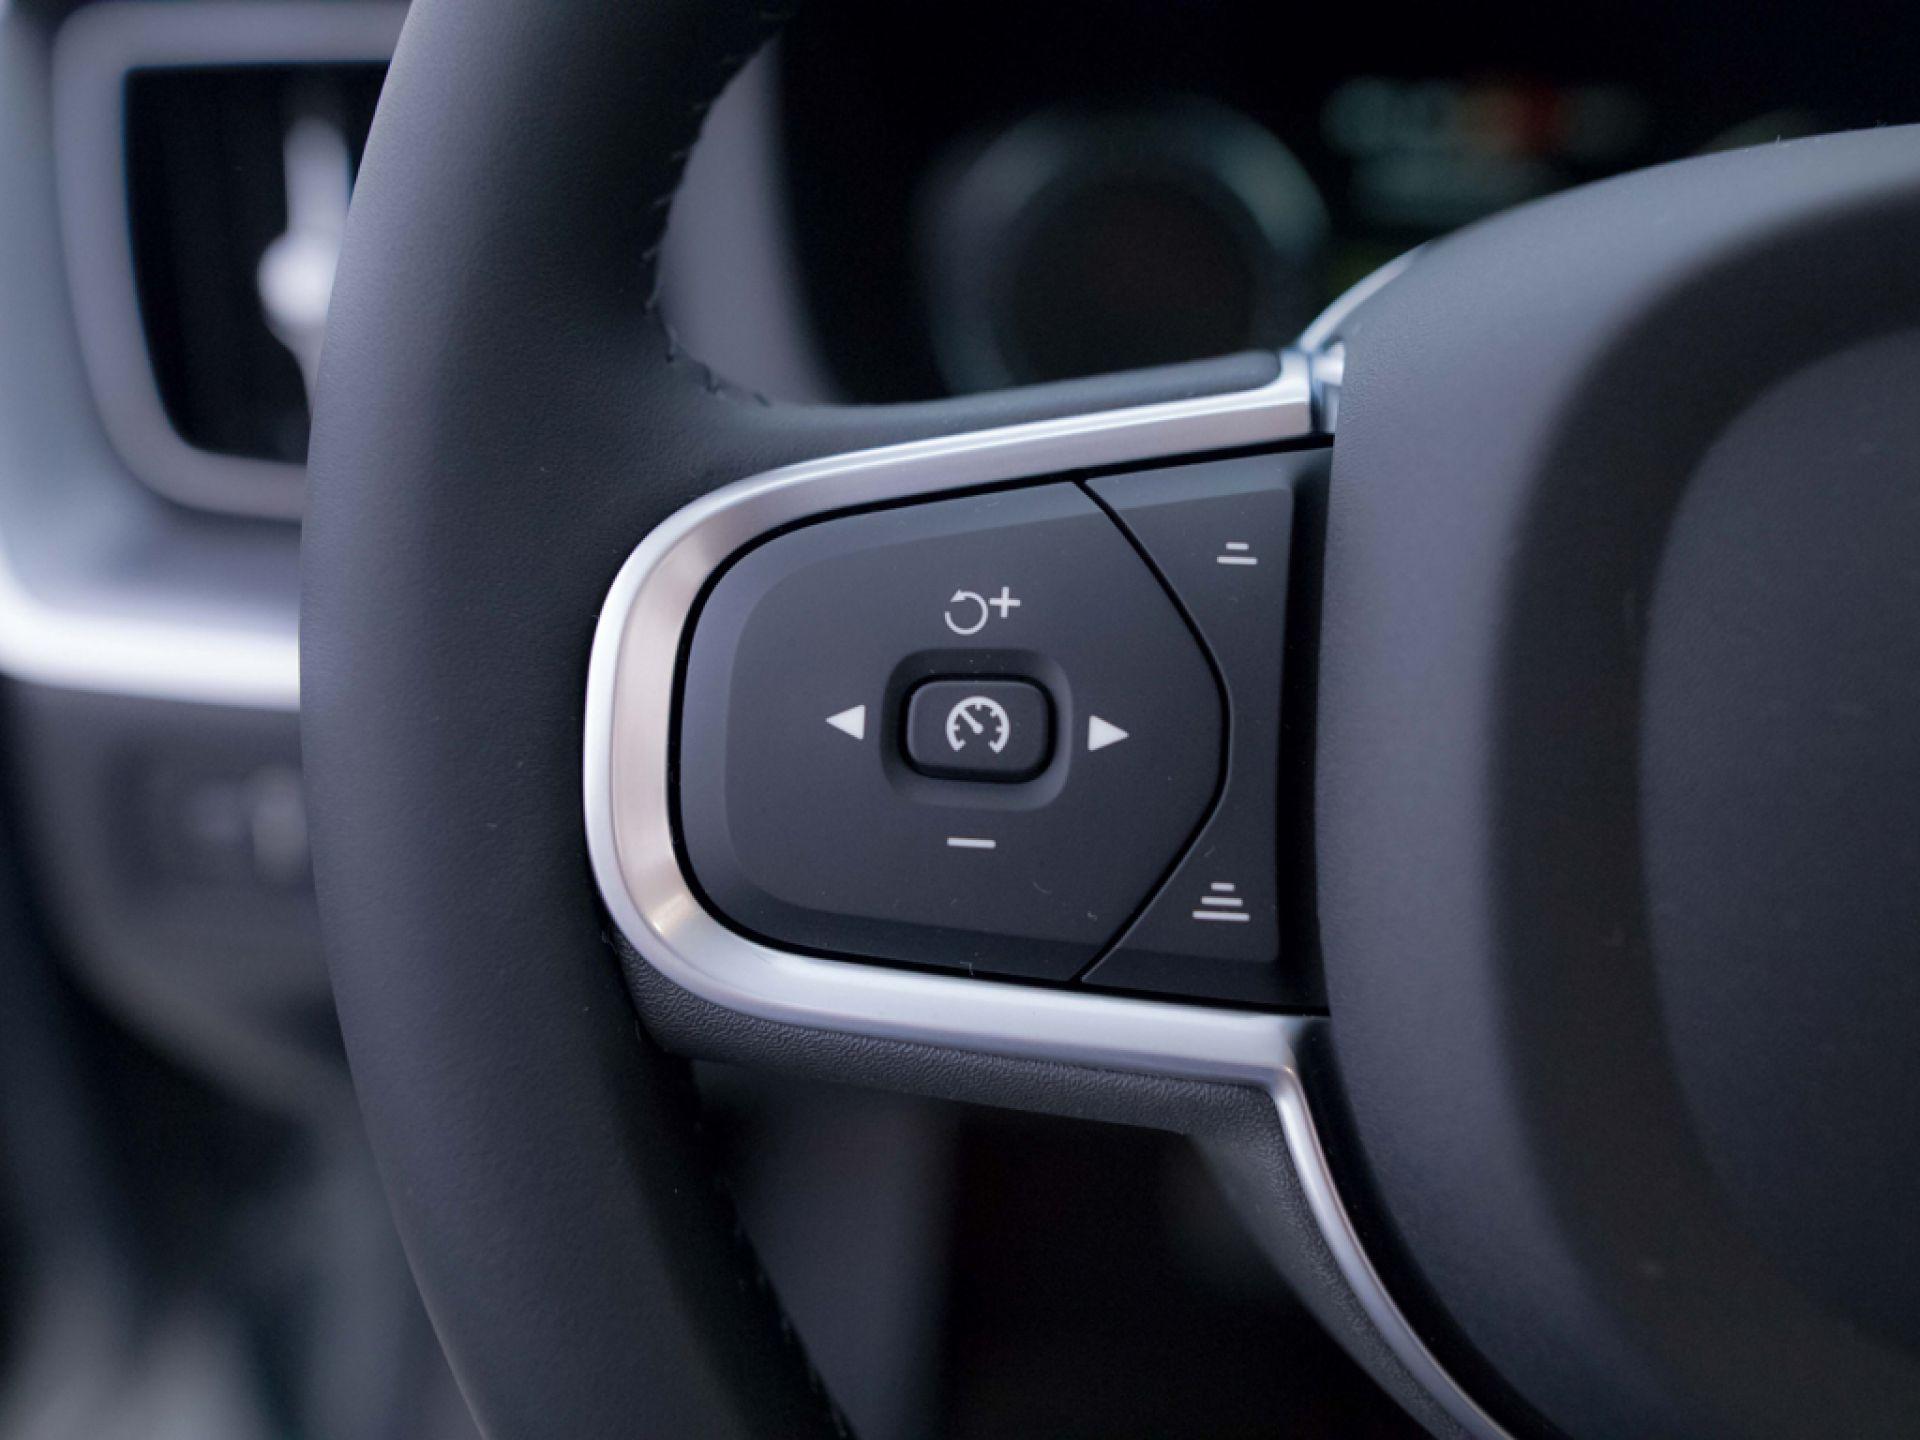 Volvo XC60 2.0 T6 AWD Recharge Inscription Exp Auto